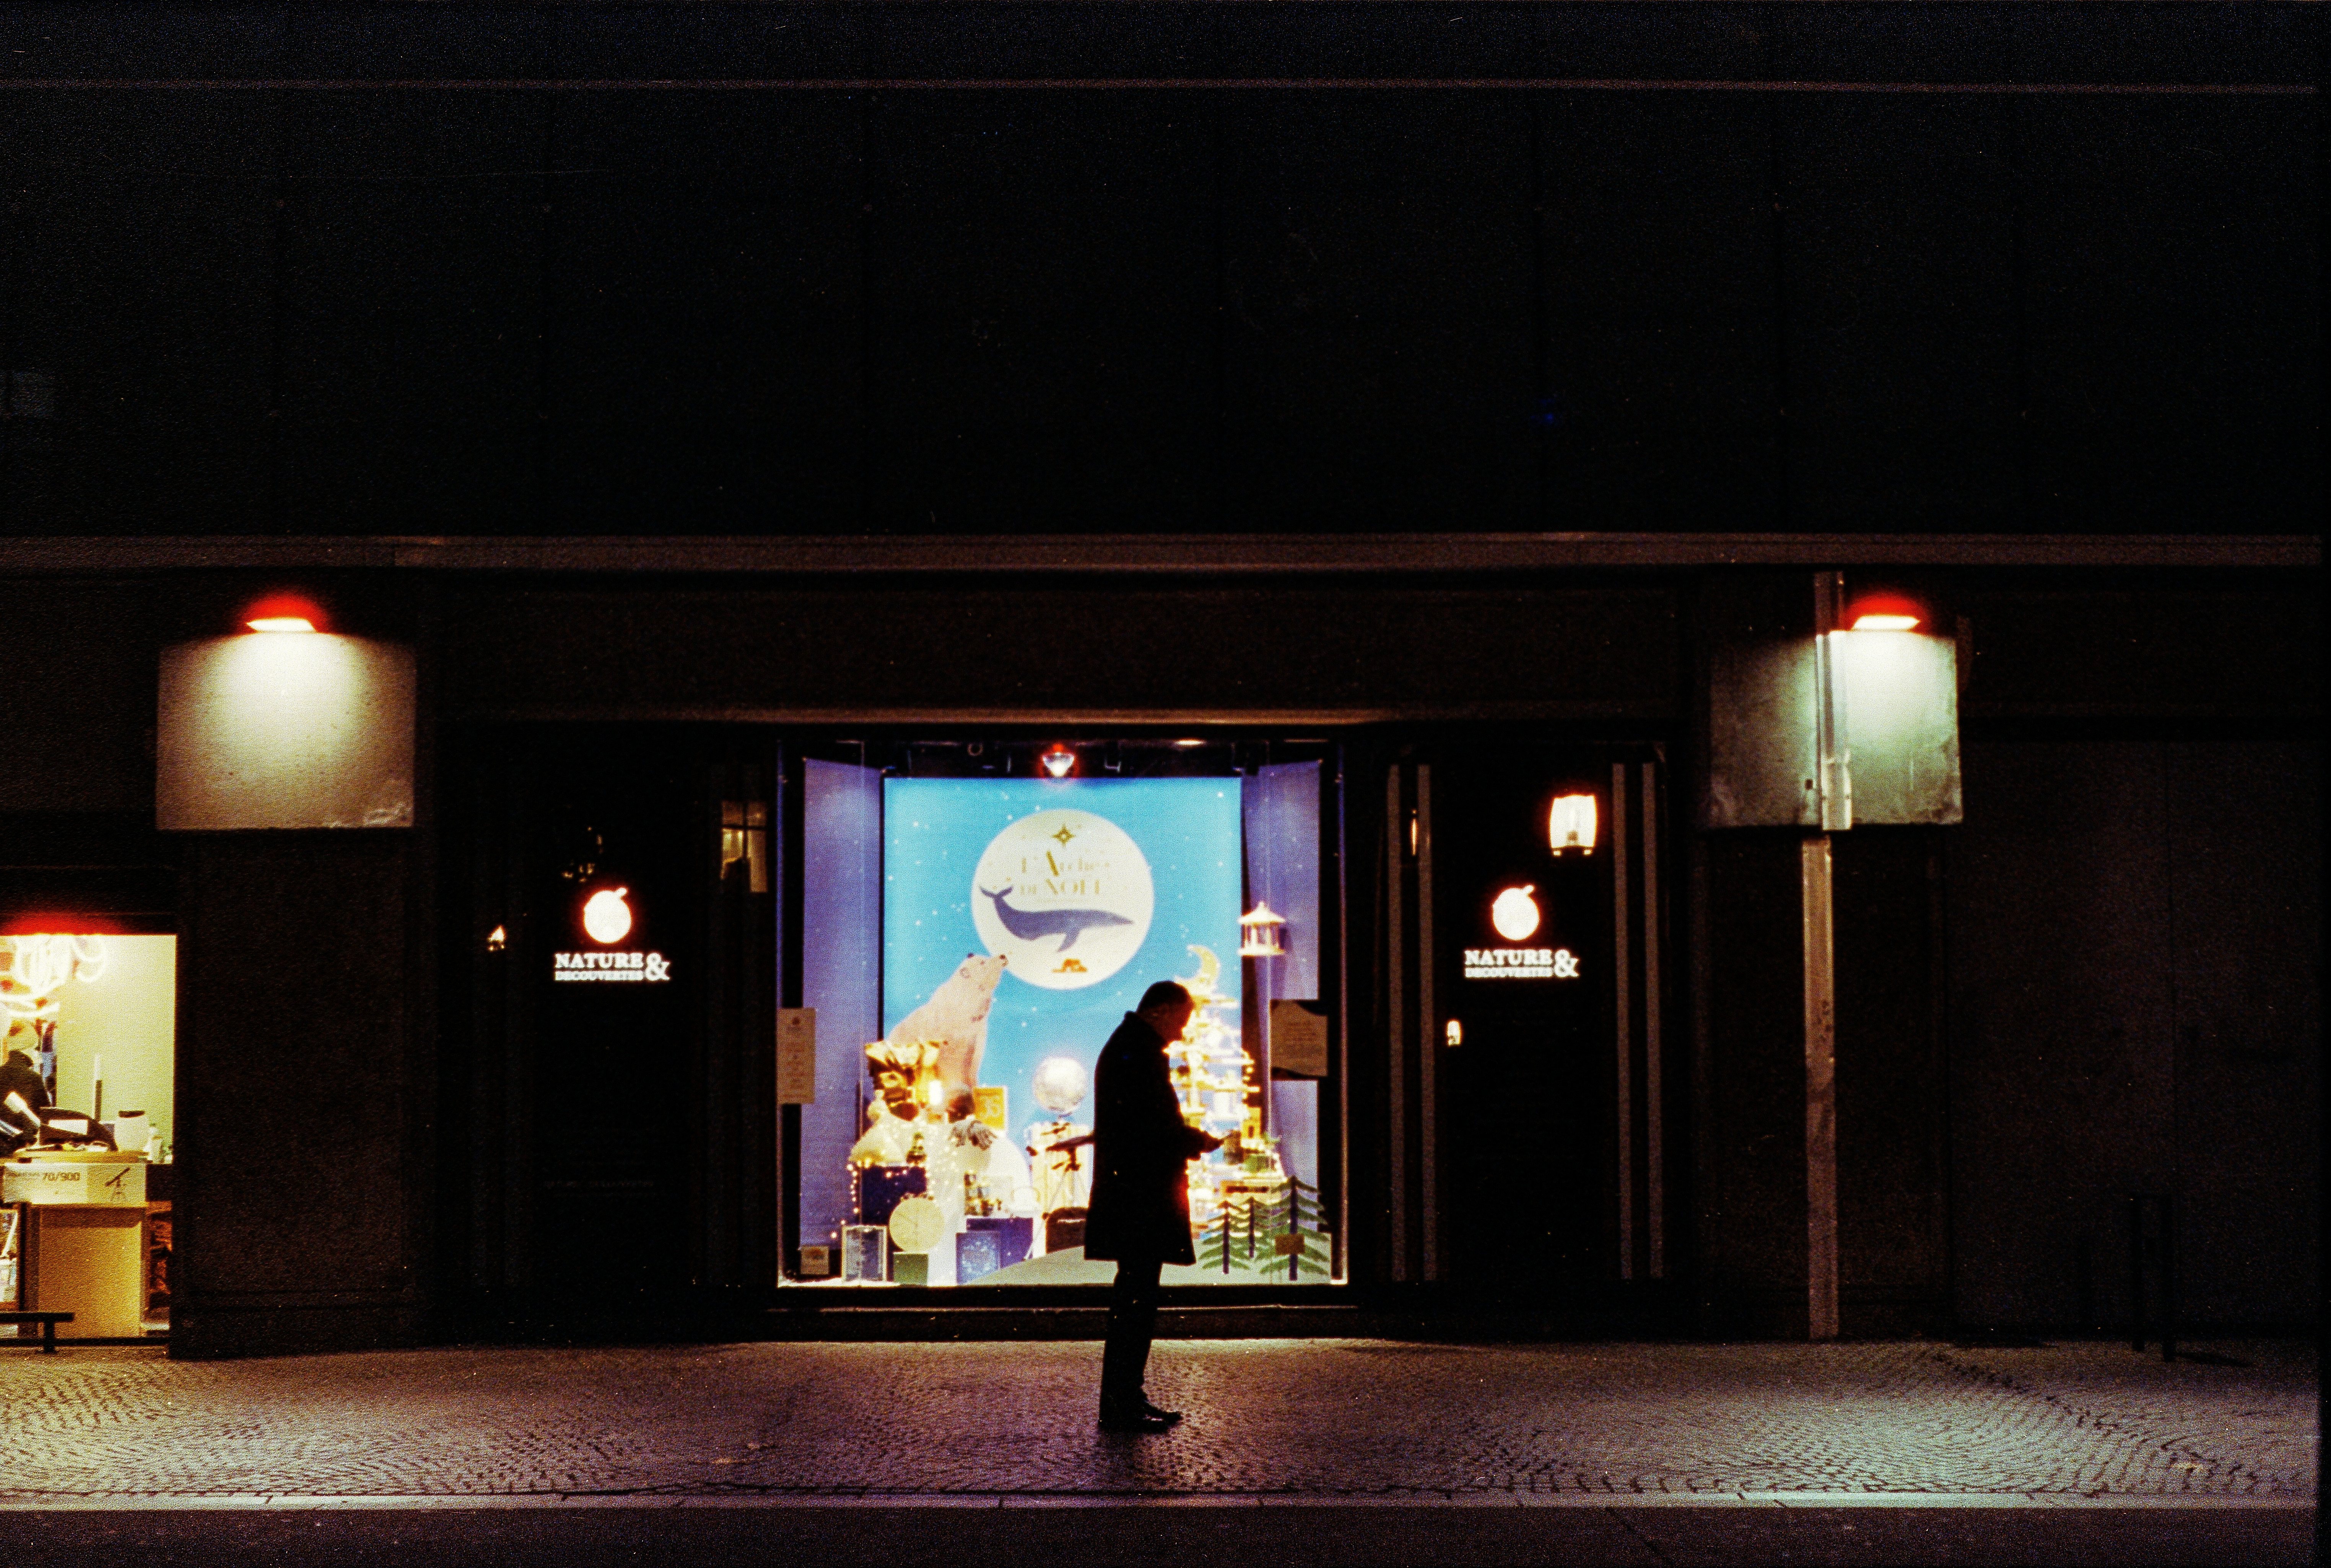 Street Photo nocturne